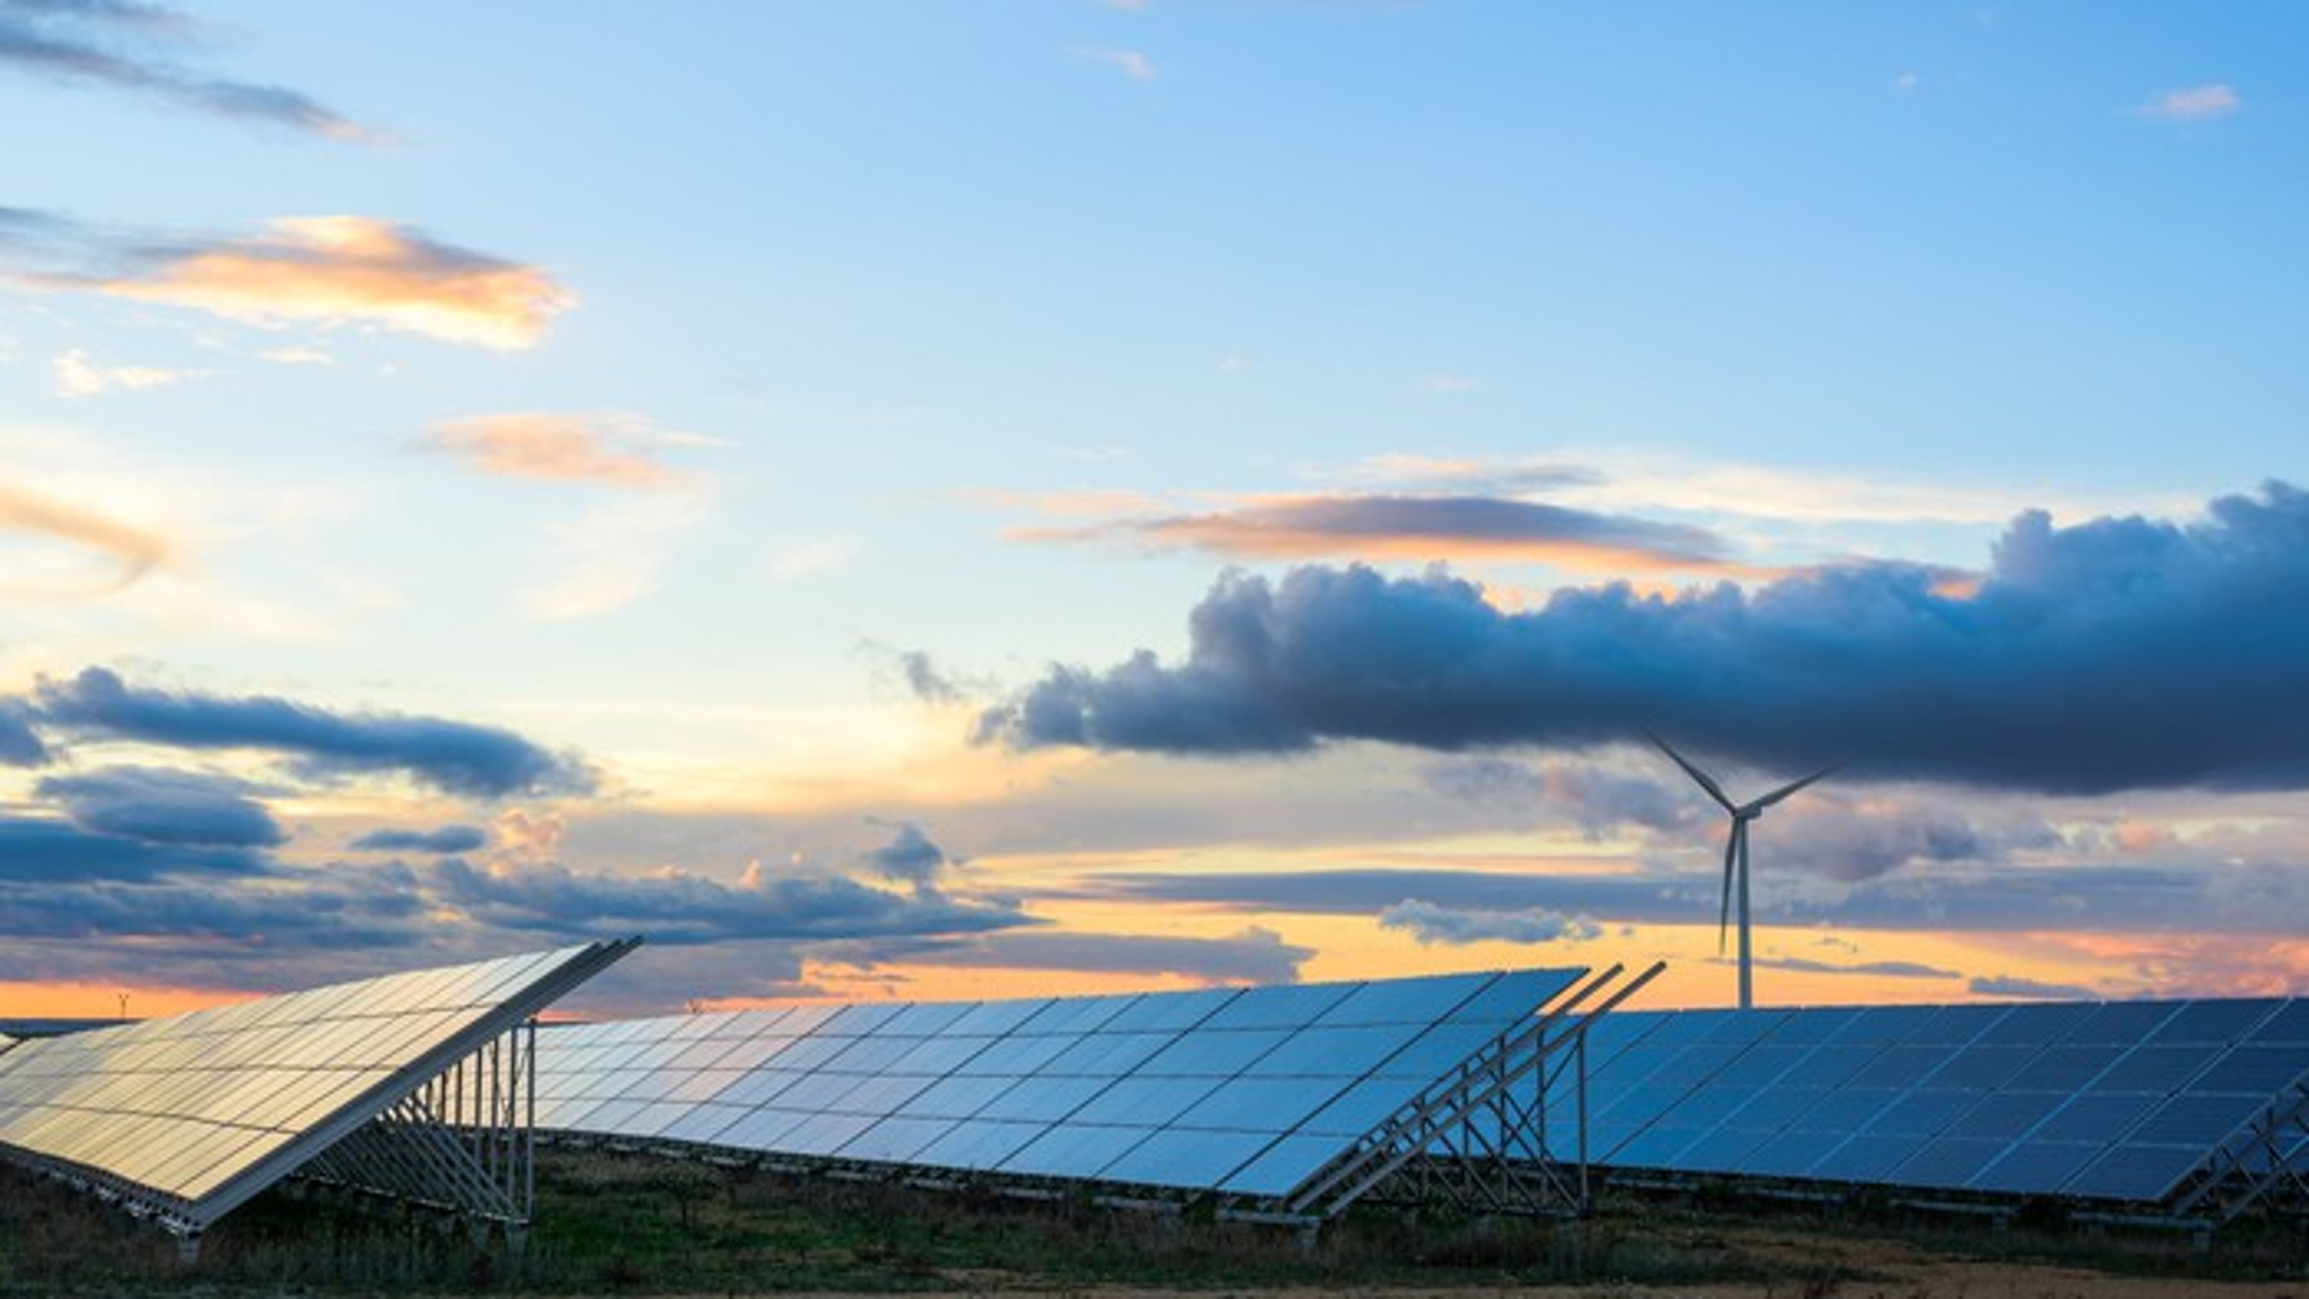 Solar panels at a large installation shown at dusk.